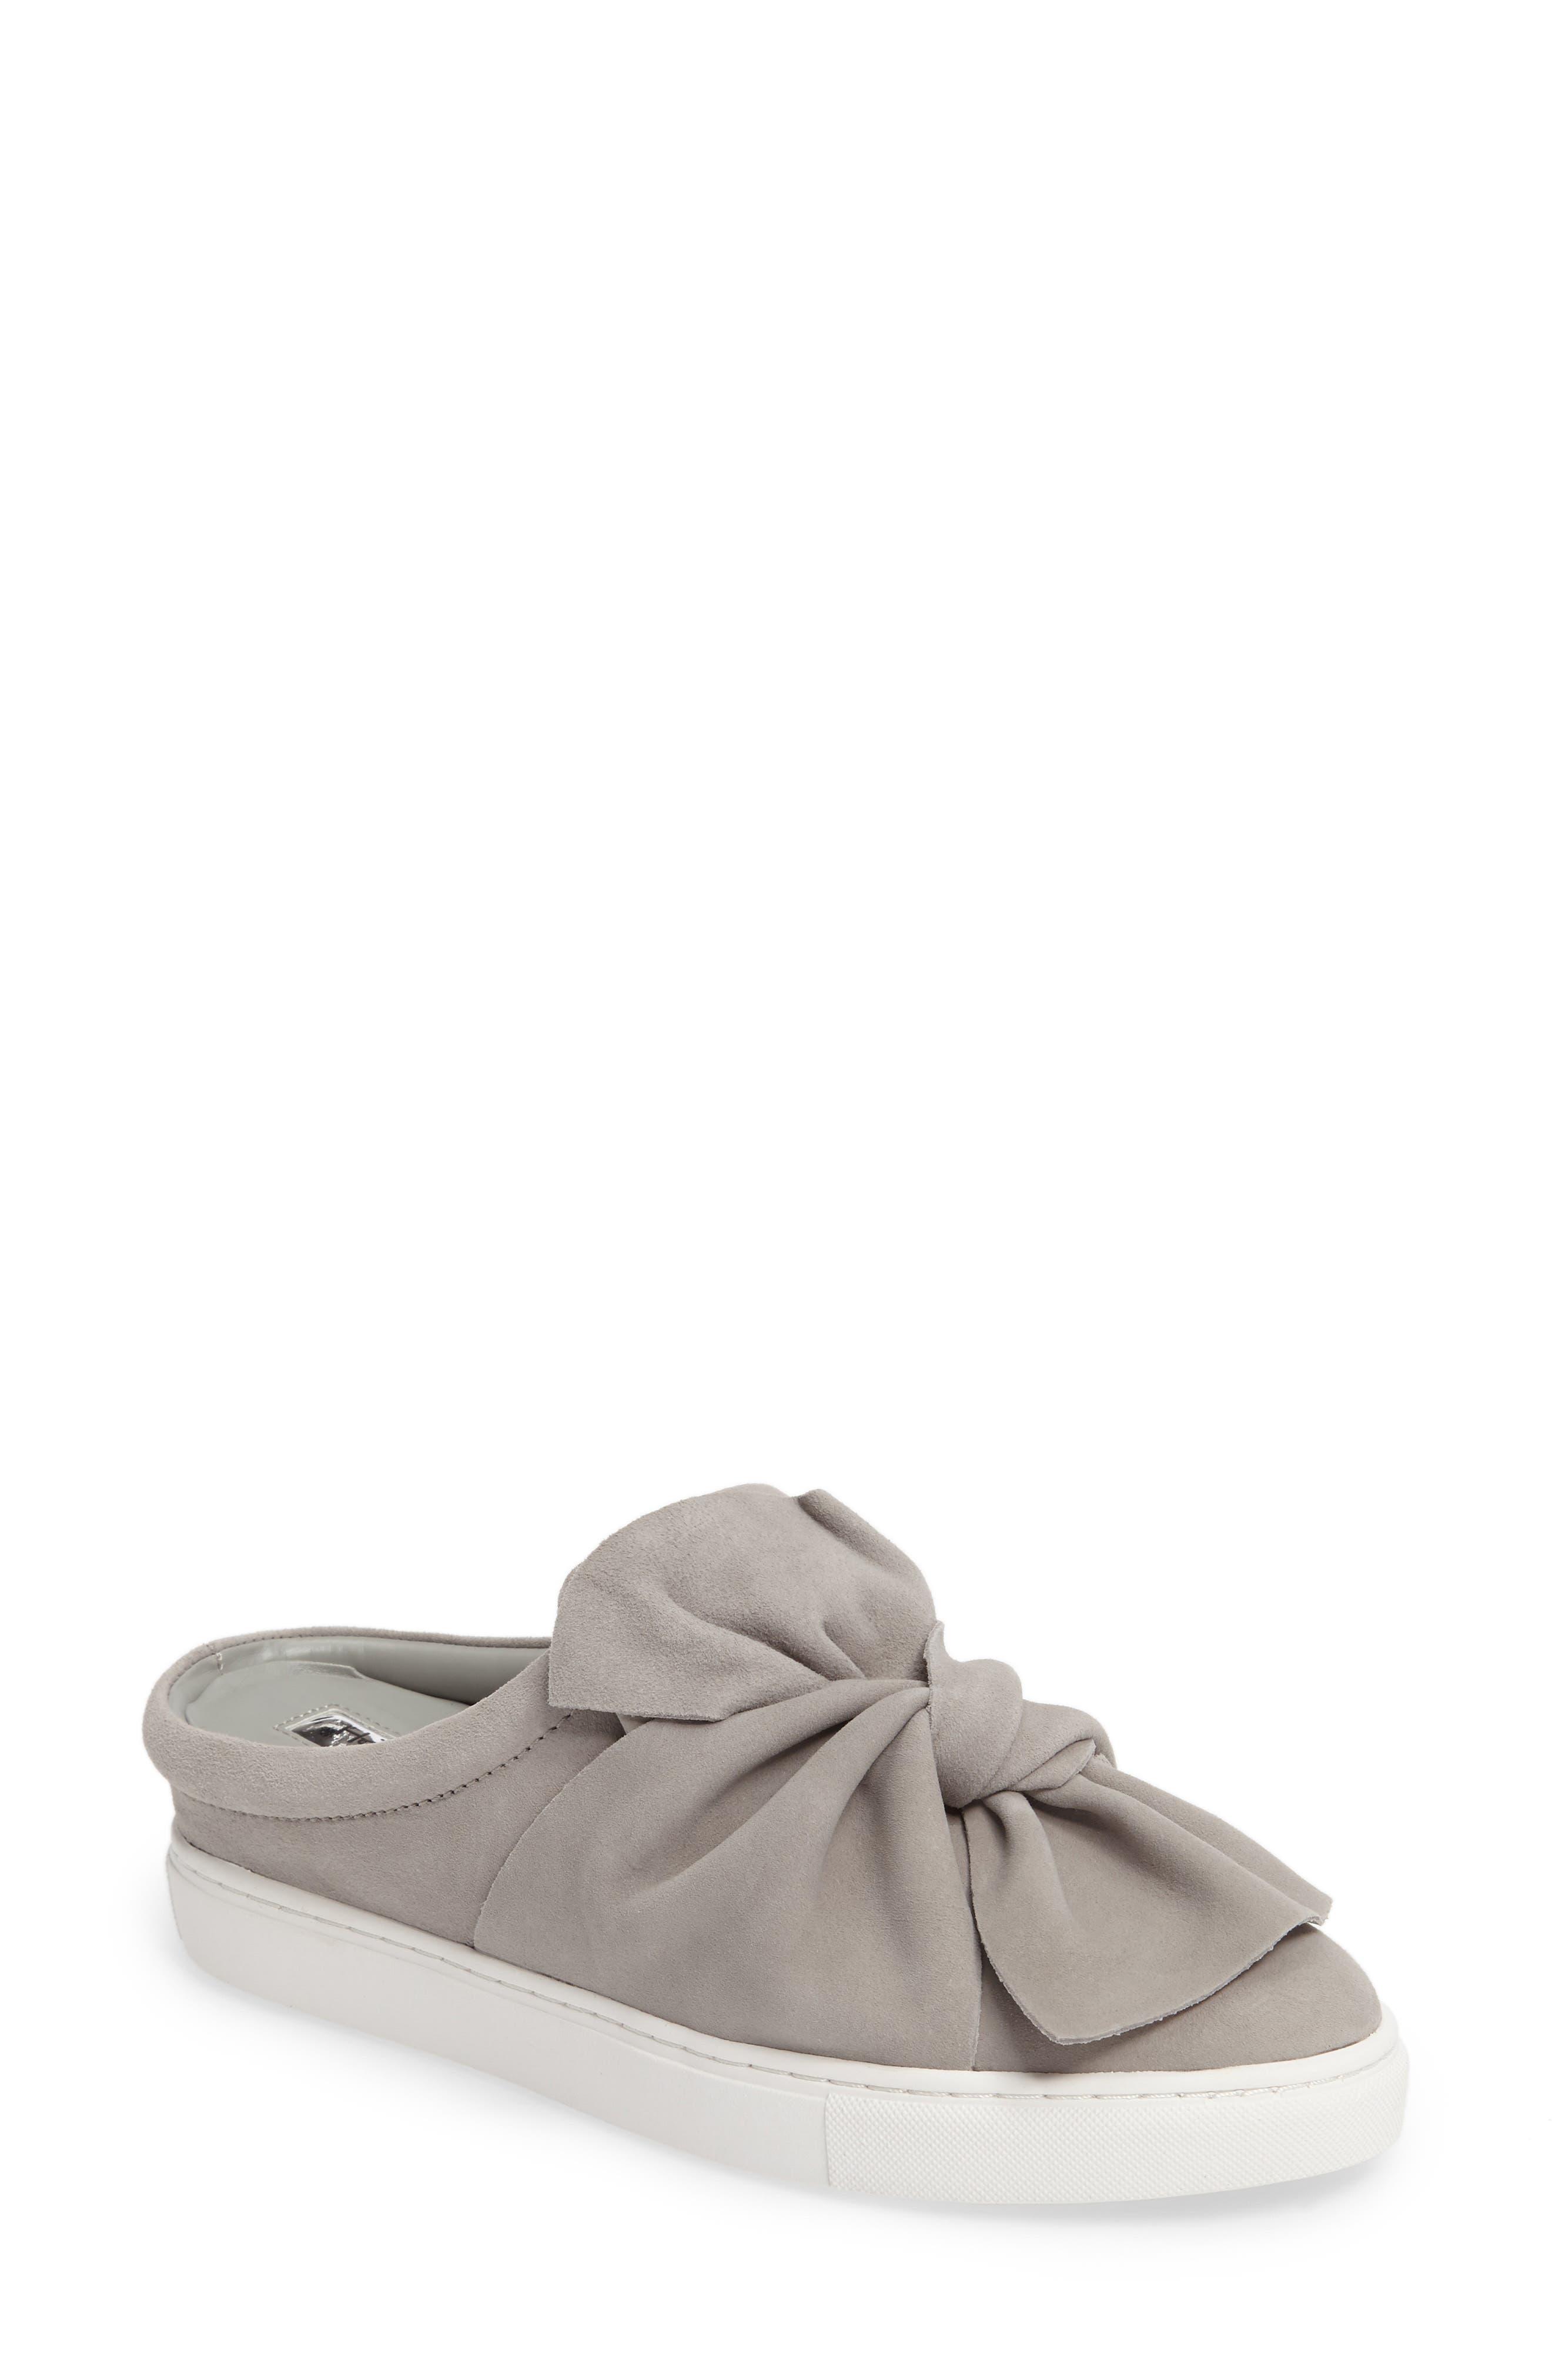 Main Image - Halogen® Manny Knotted Slip-On Sneaker (Women)